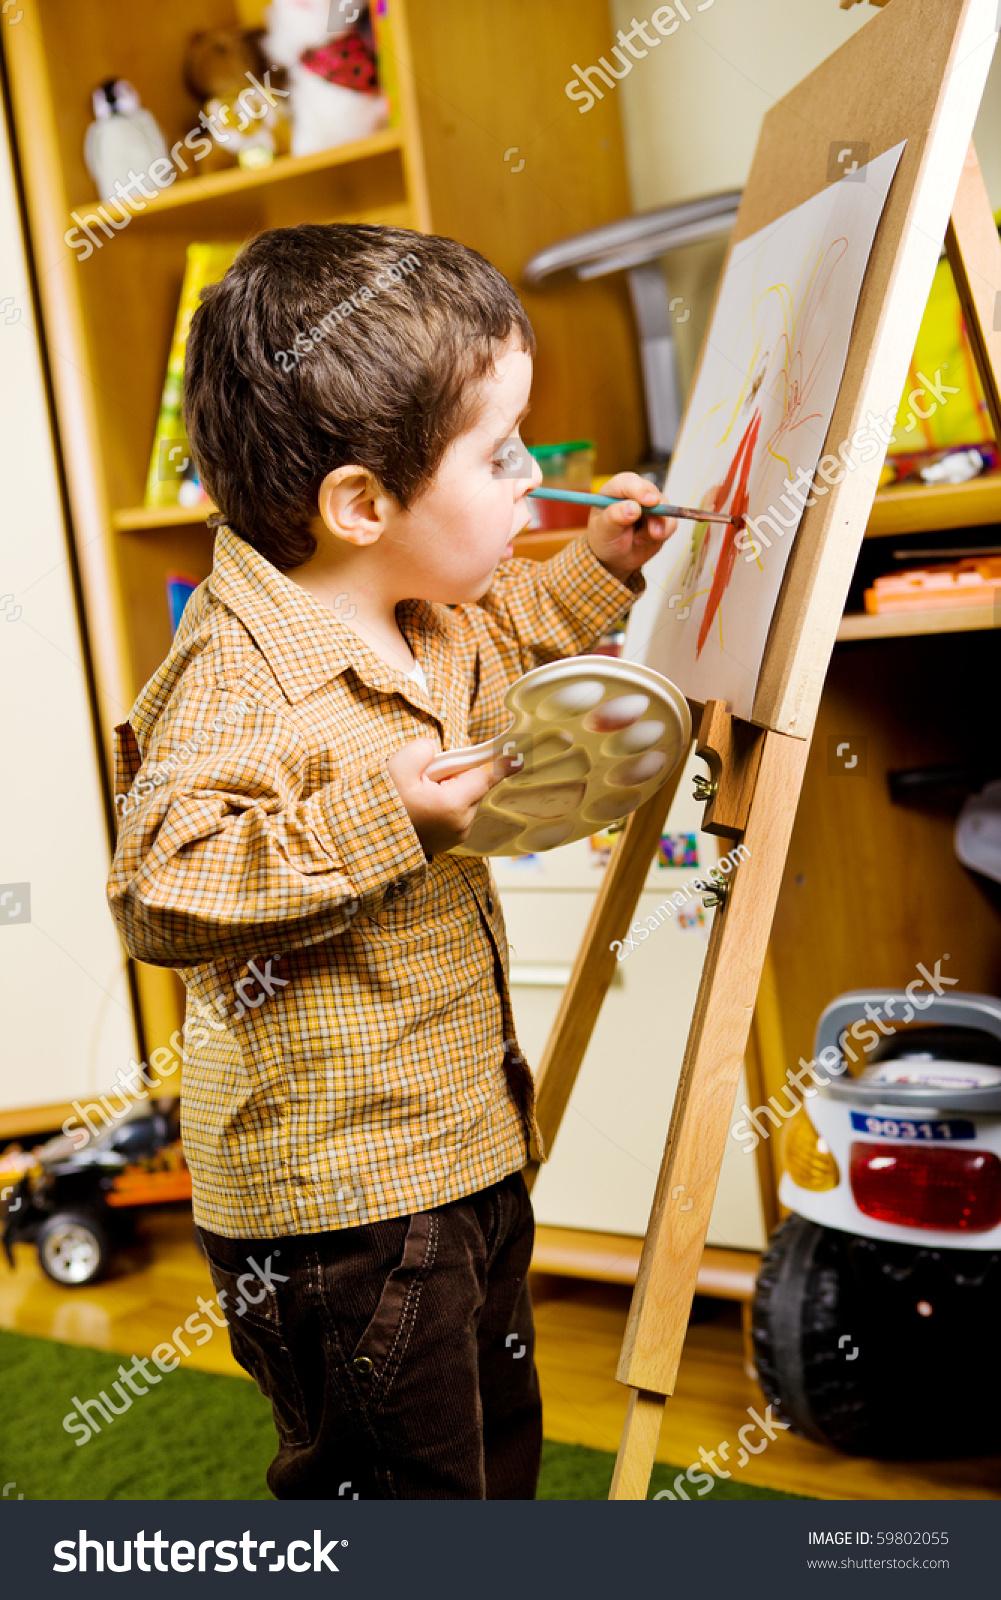 Preschool Boy Painting In His Room Stock Photo 59802055